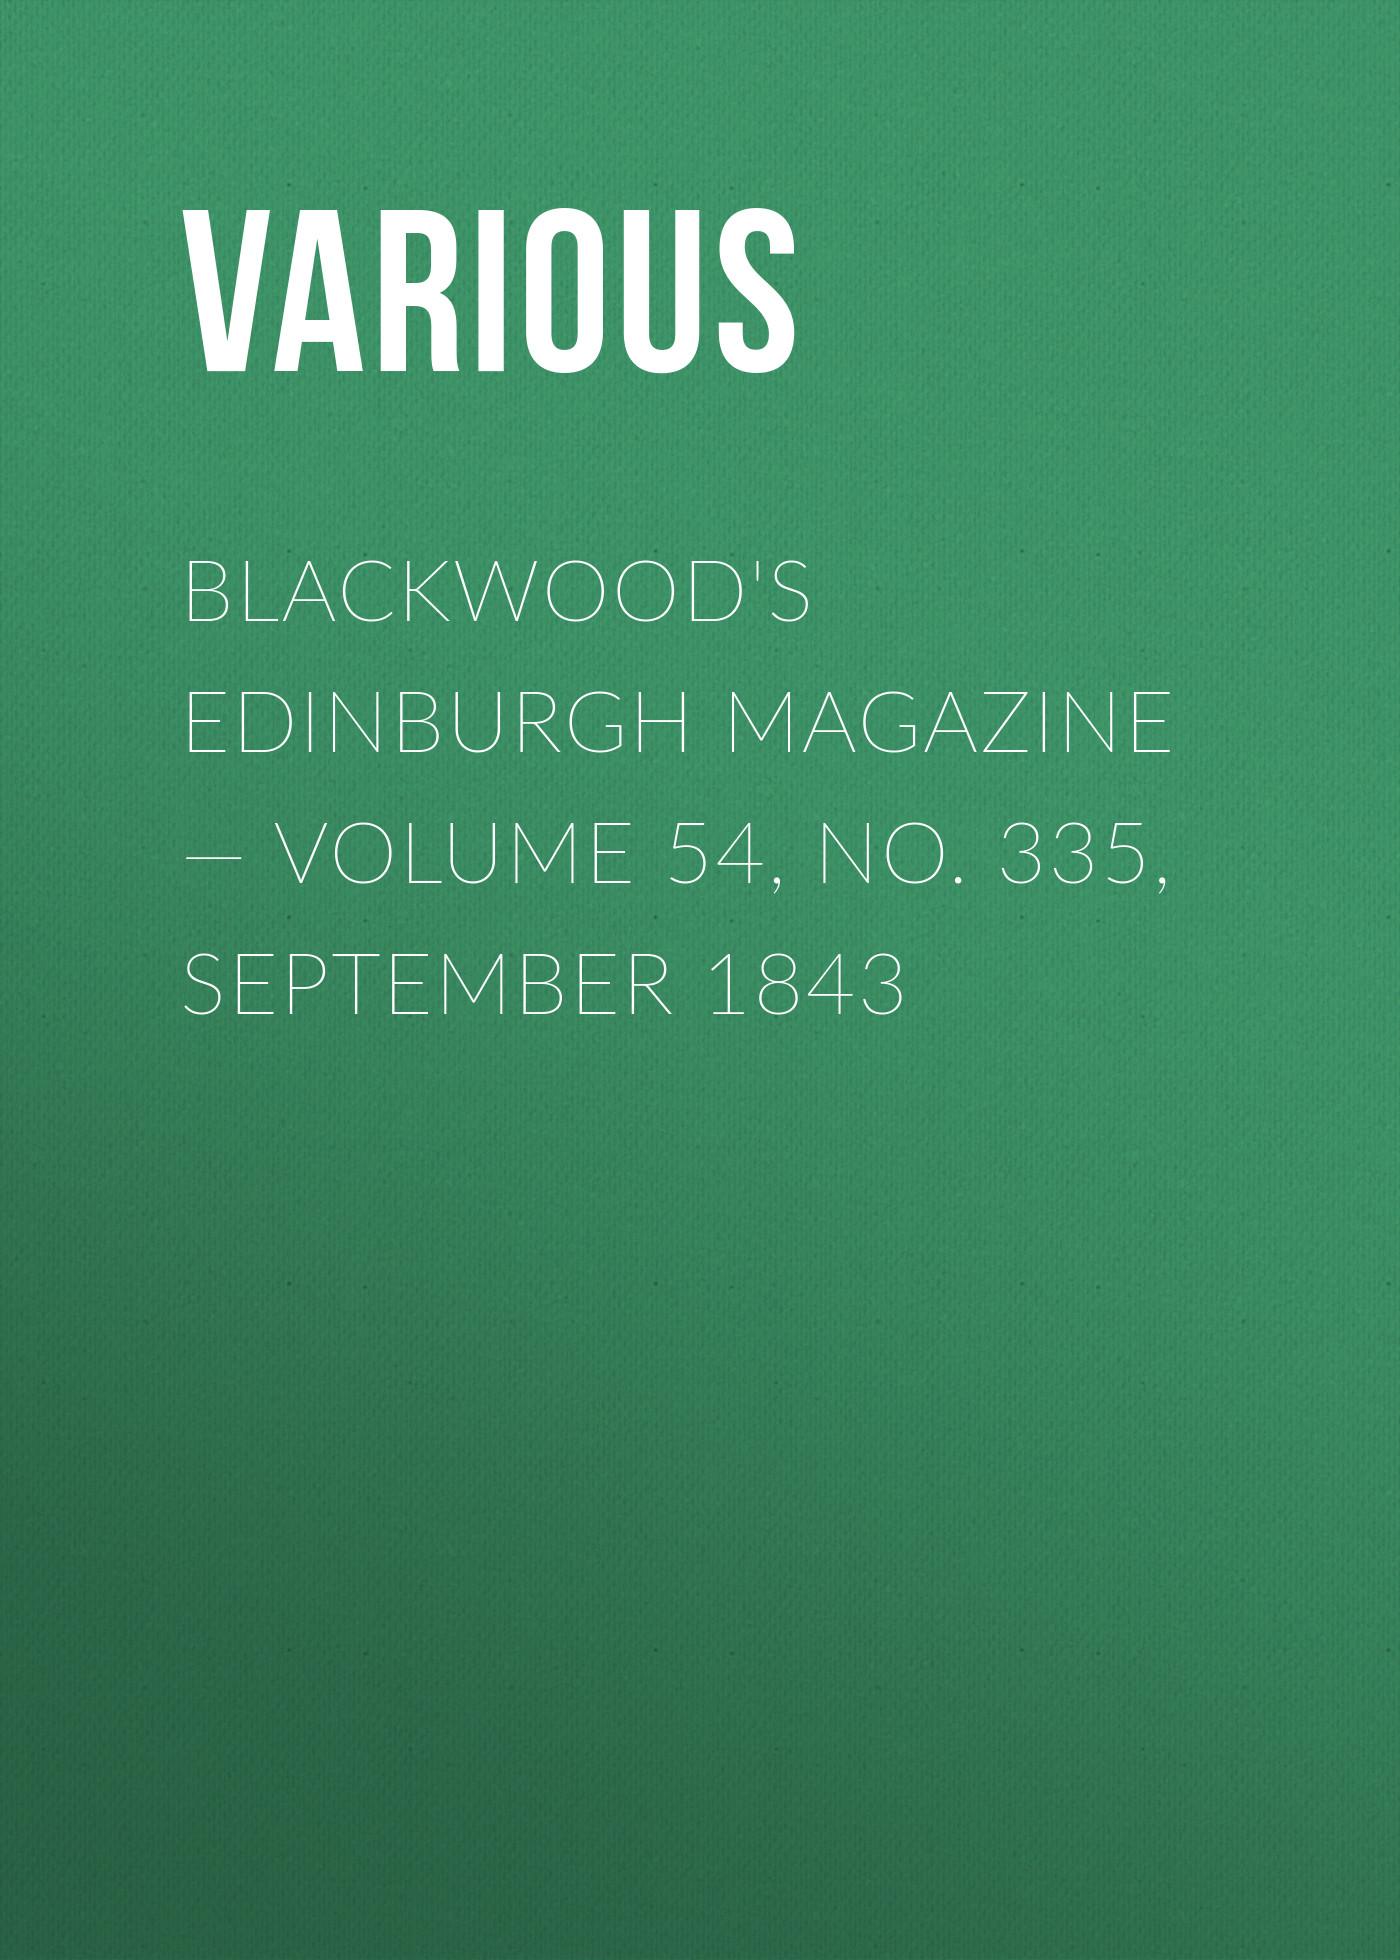 Blackwood\'s Edinburgh Magazine — Volume 54, No. 335, September 1843 ( Various  )